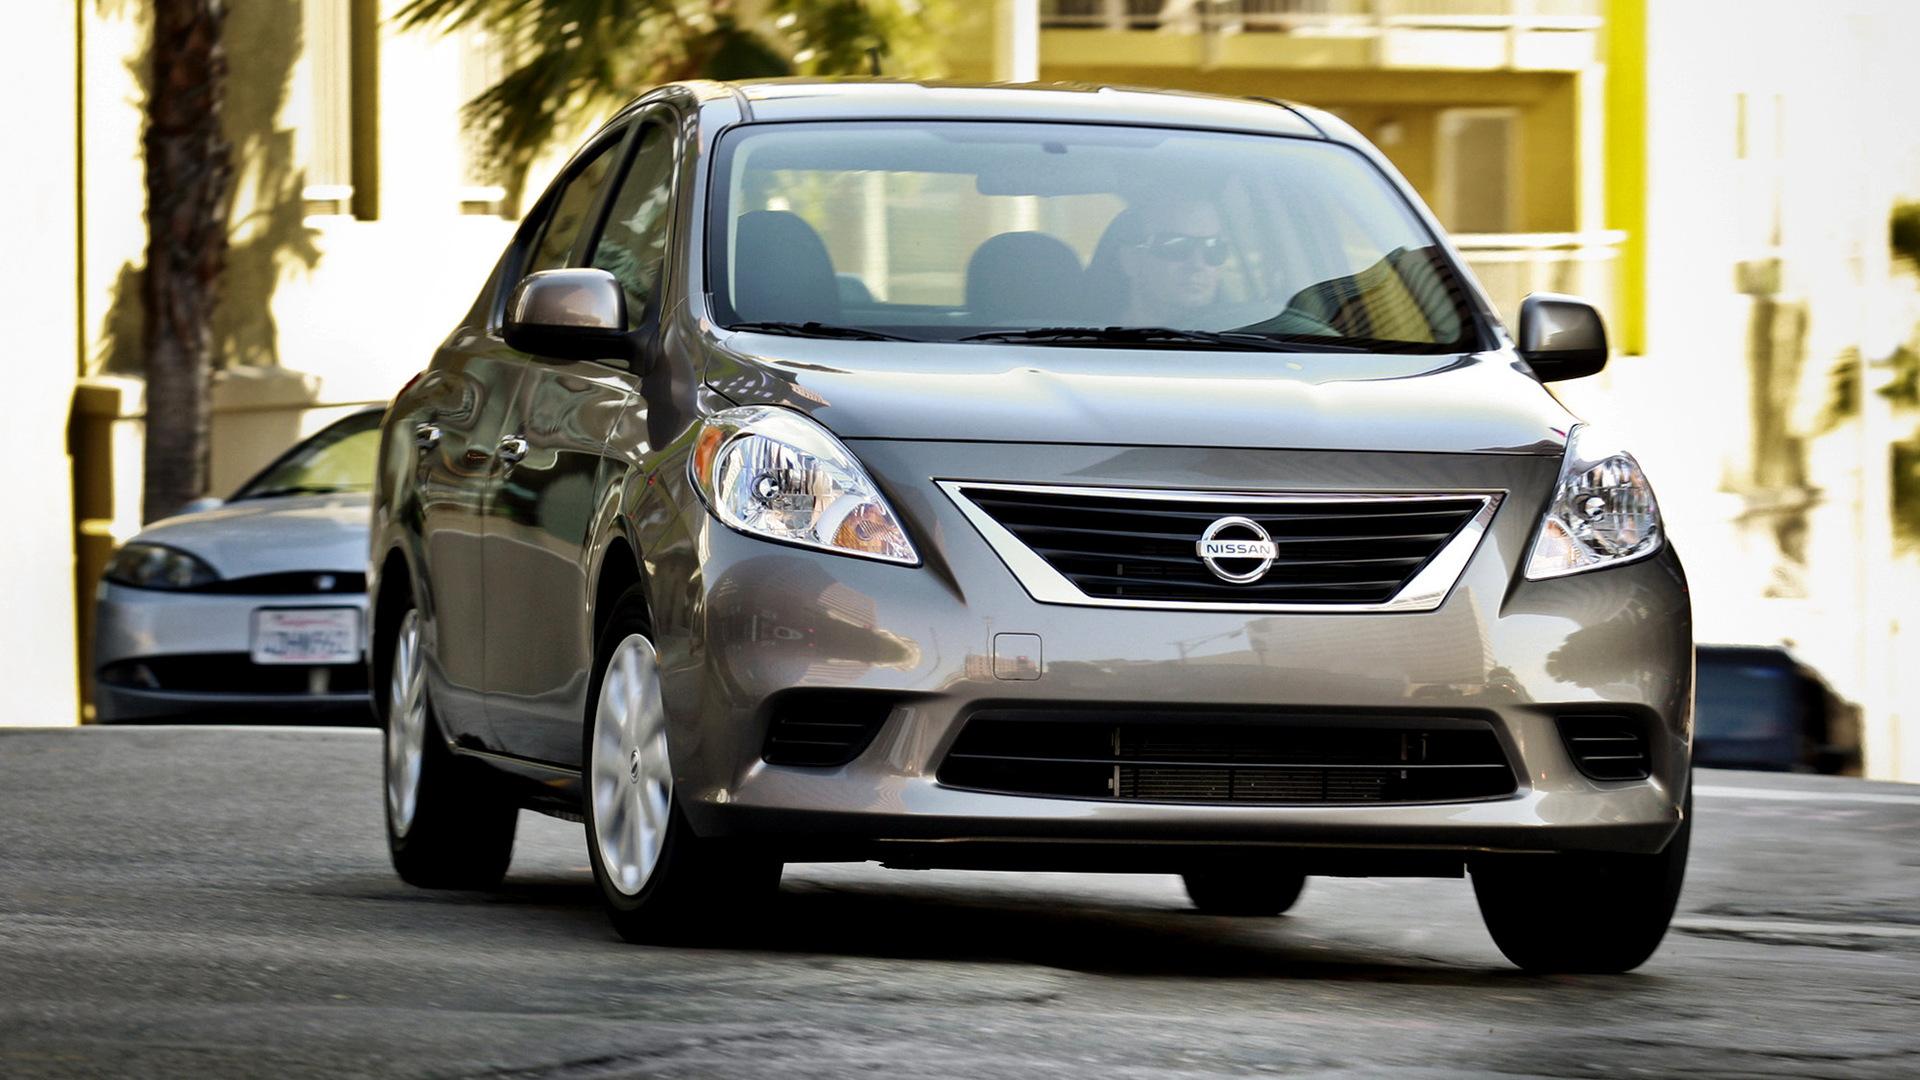 Nissan versa sedan 2012 wallpapers and hd images car pixel nissan versa sedan 2012 thumbnail 4792 4792 hd 169 vanachro Images